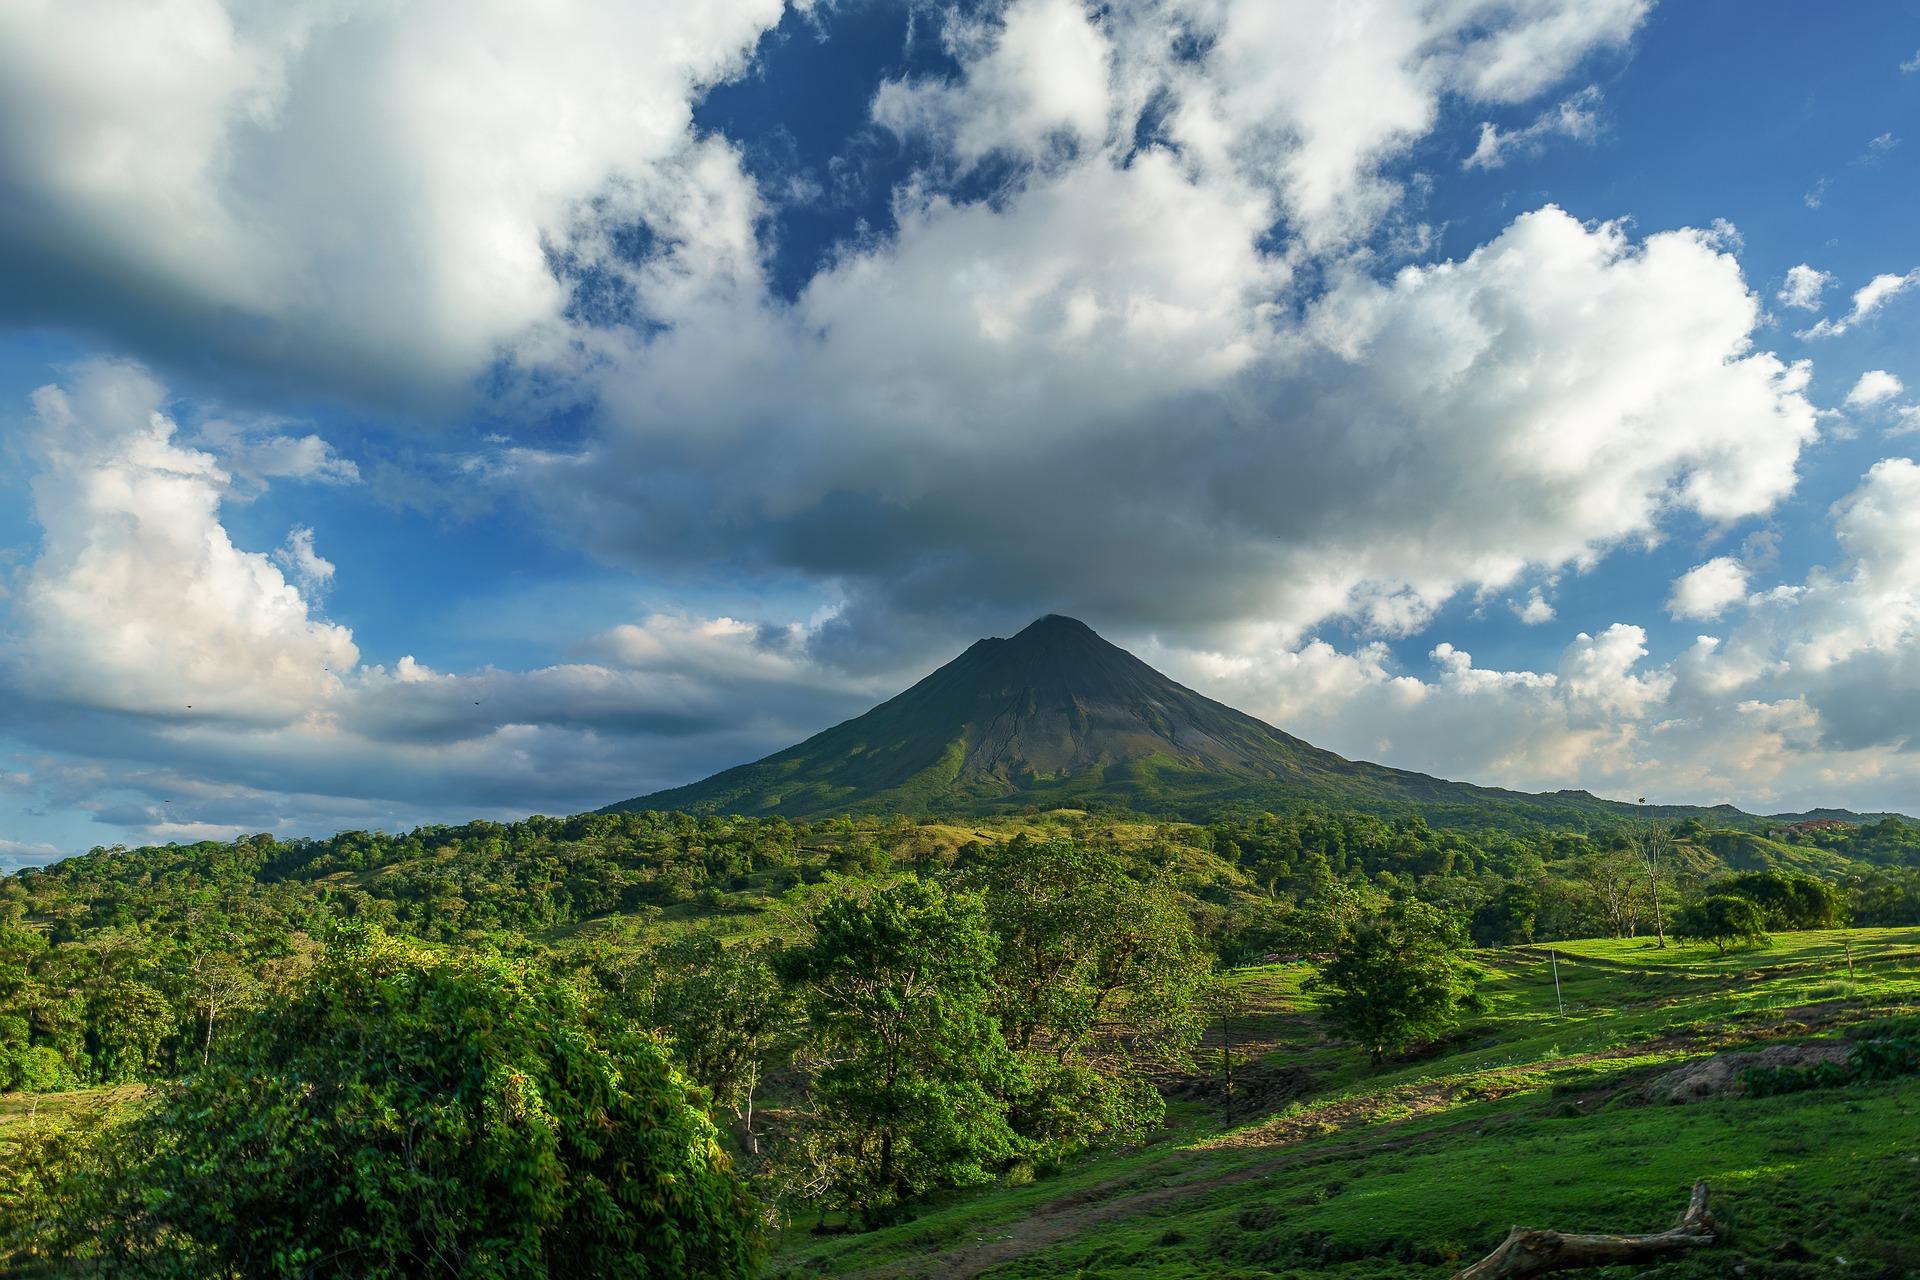 melhores lugares para viajar na América Latina: San José